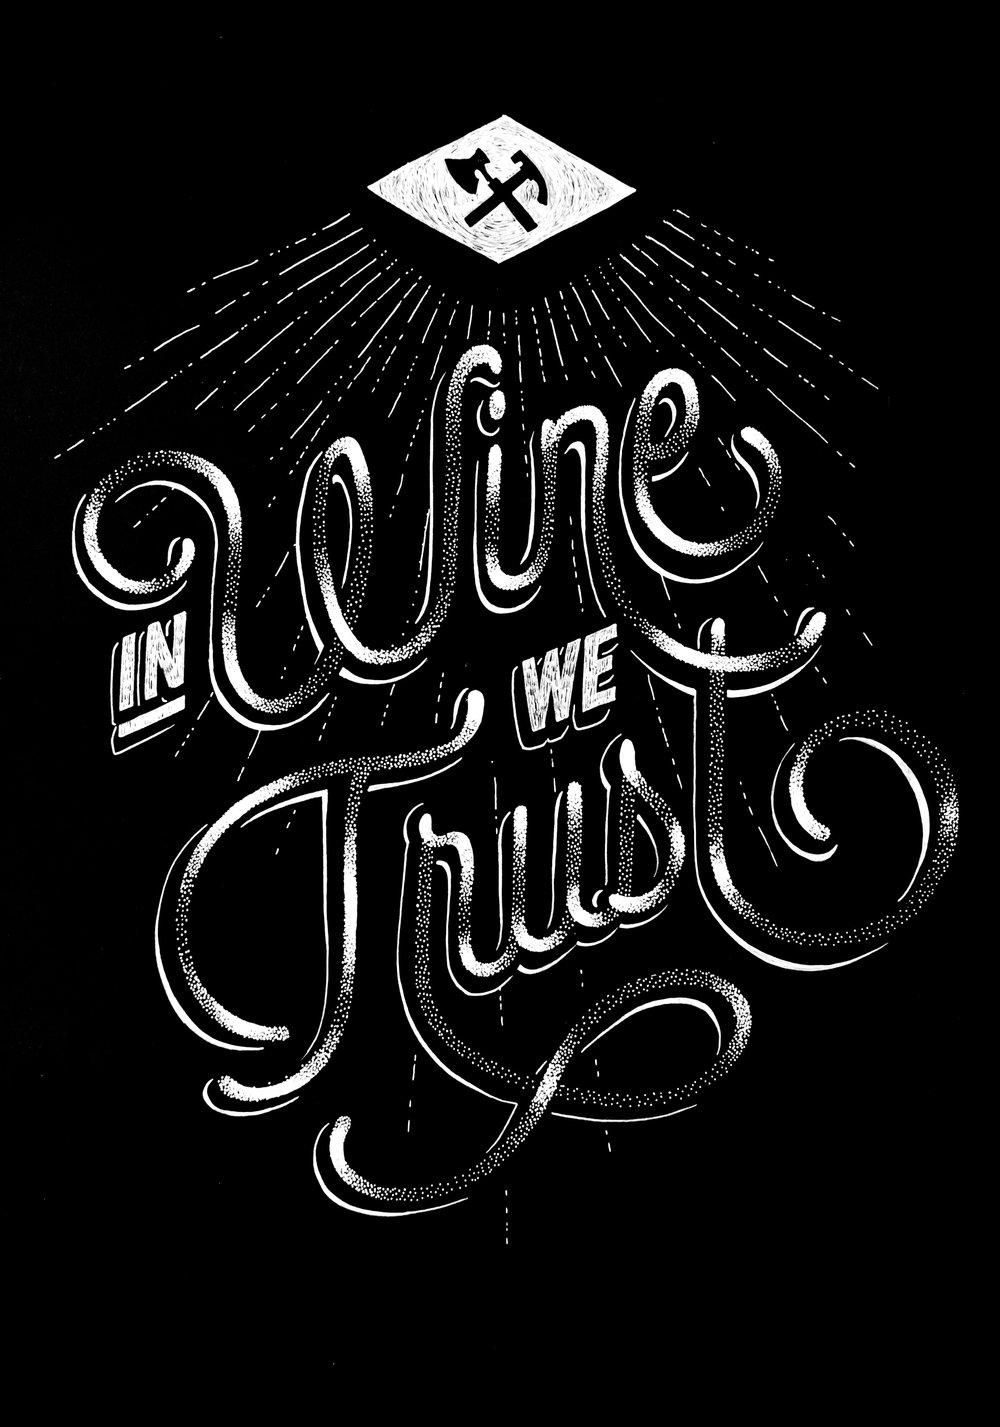 Ine wine we trust poster amandine Delaunay winerie parisienne